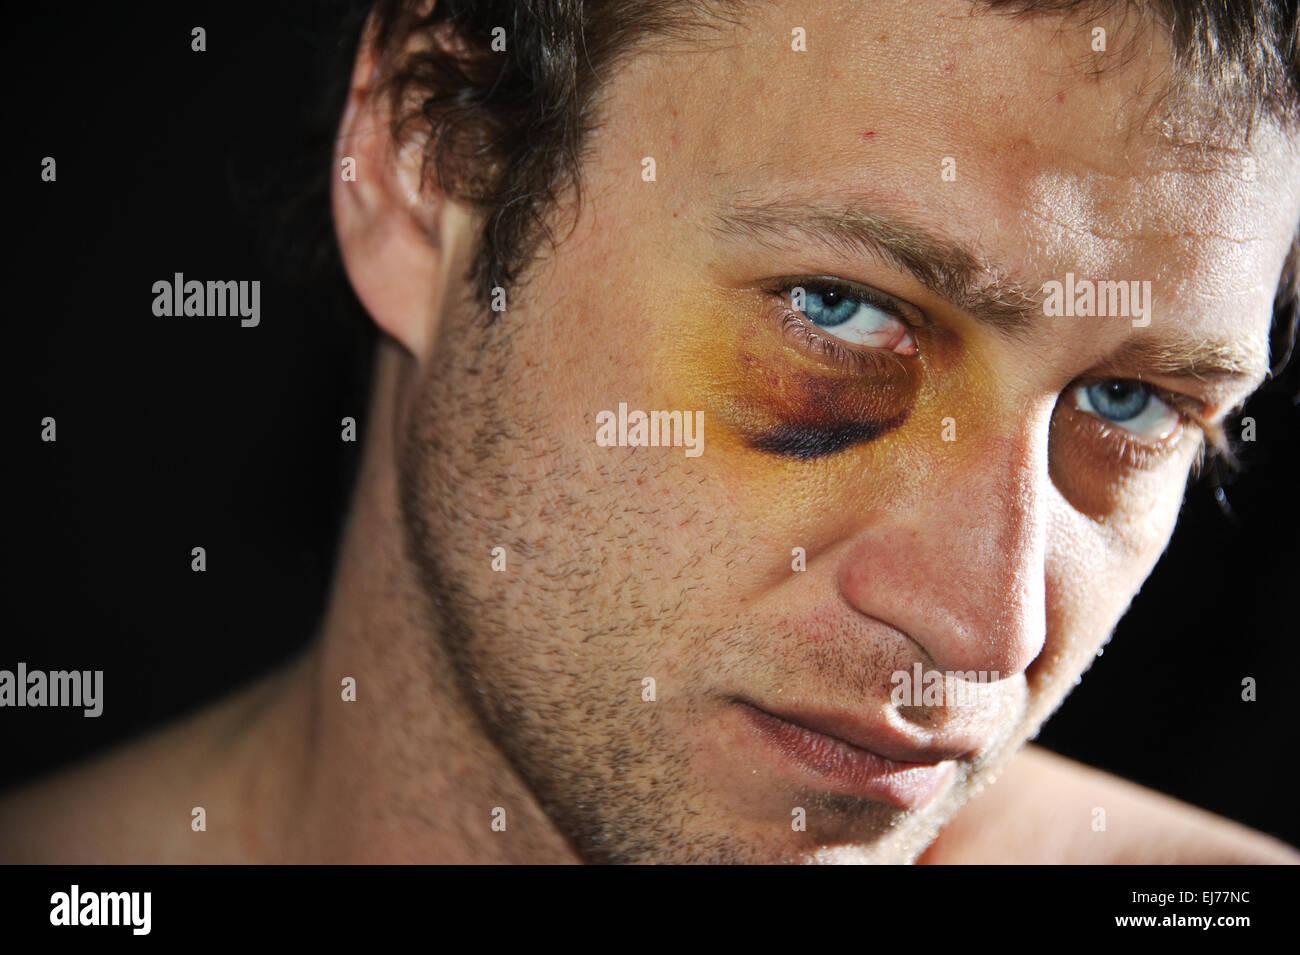 Bruised eye. - Stock Image